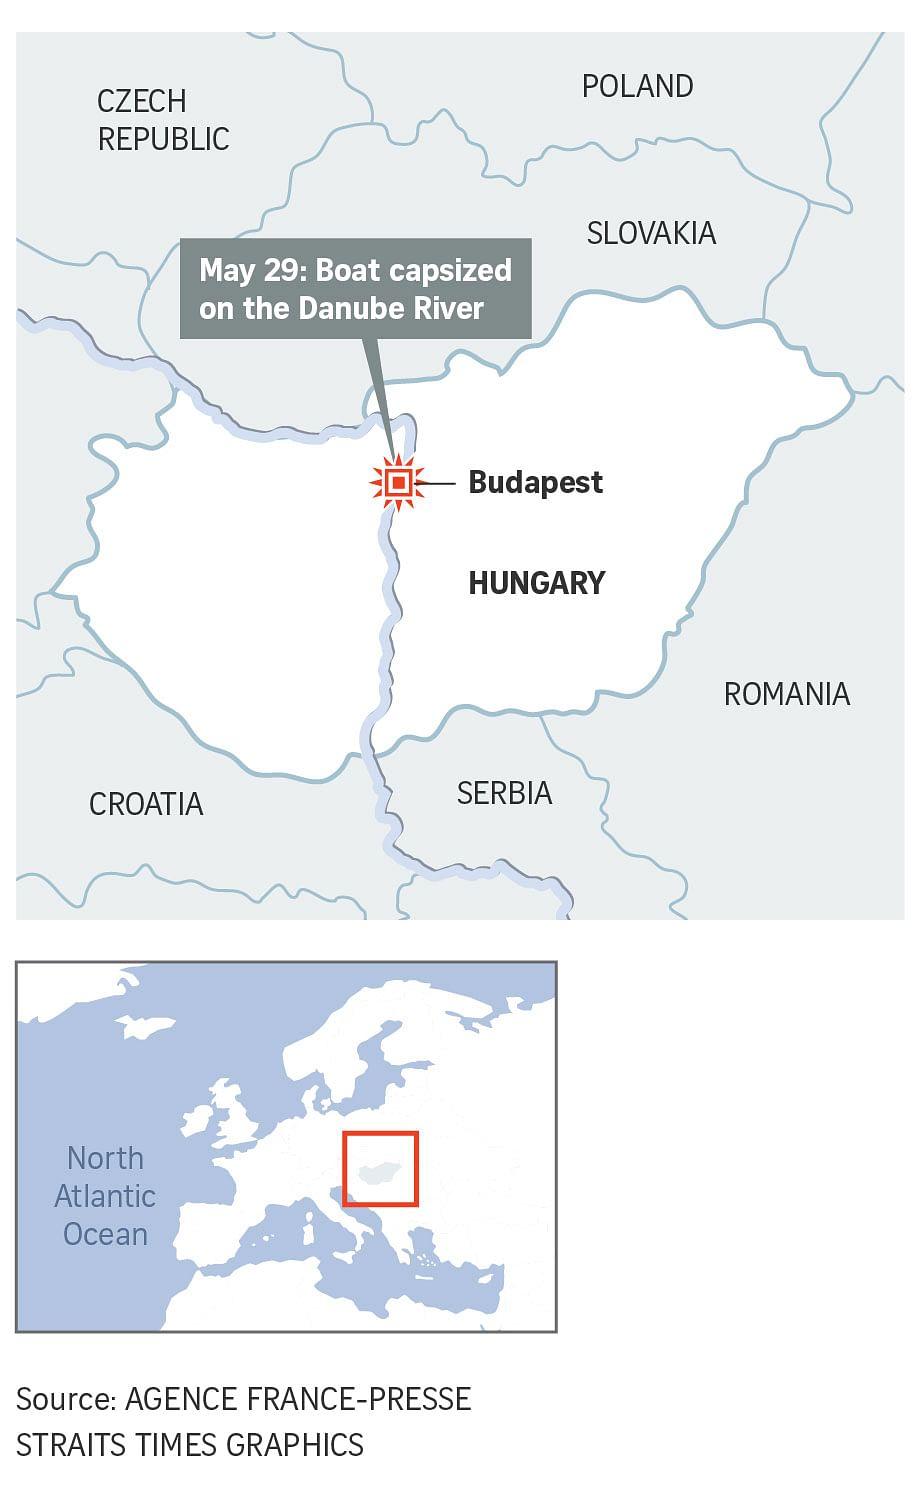 Seven South Koreans dead, hope dims for missing in Budapest